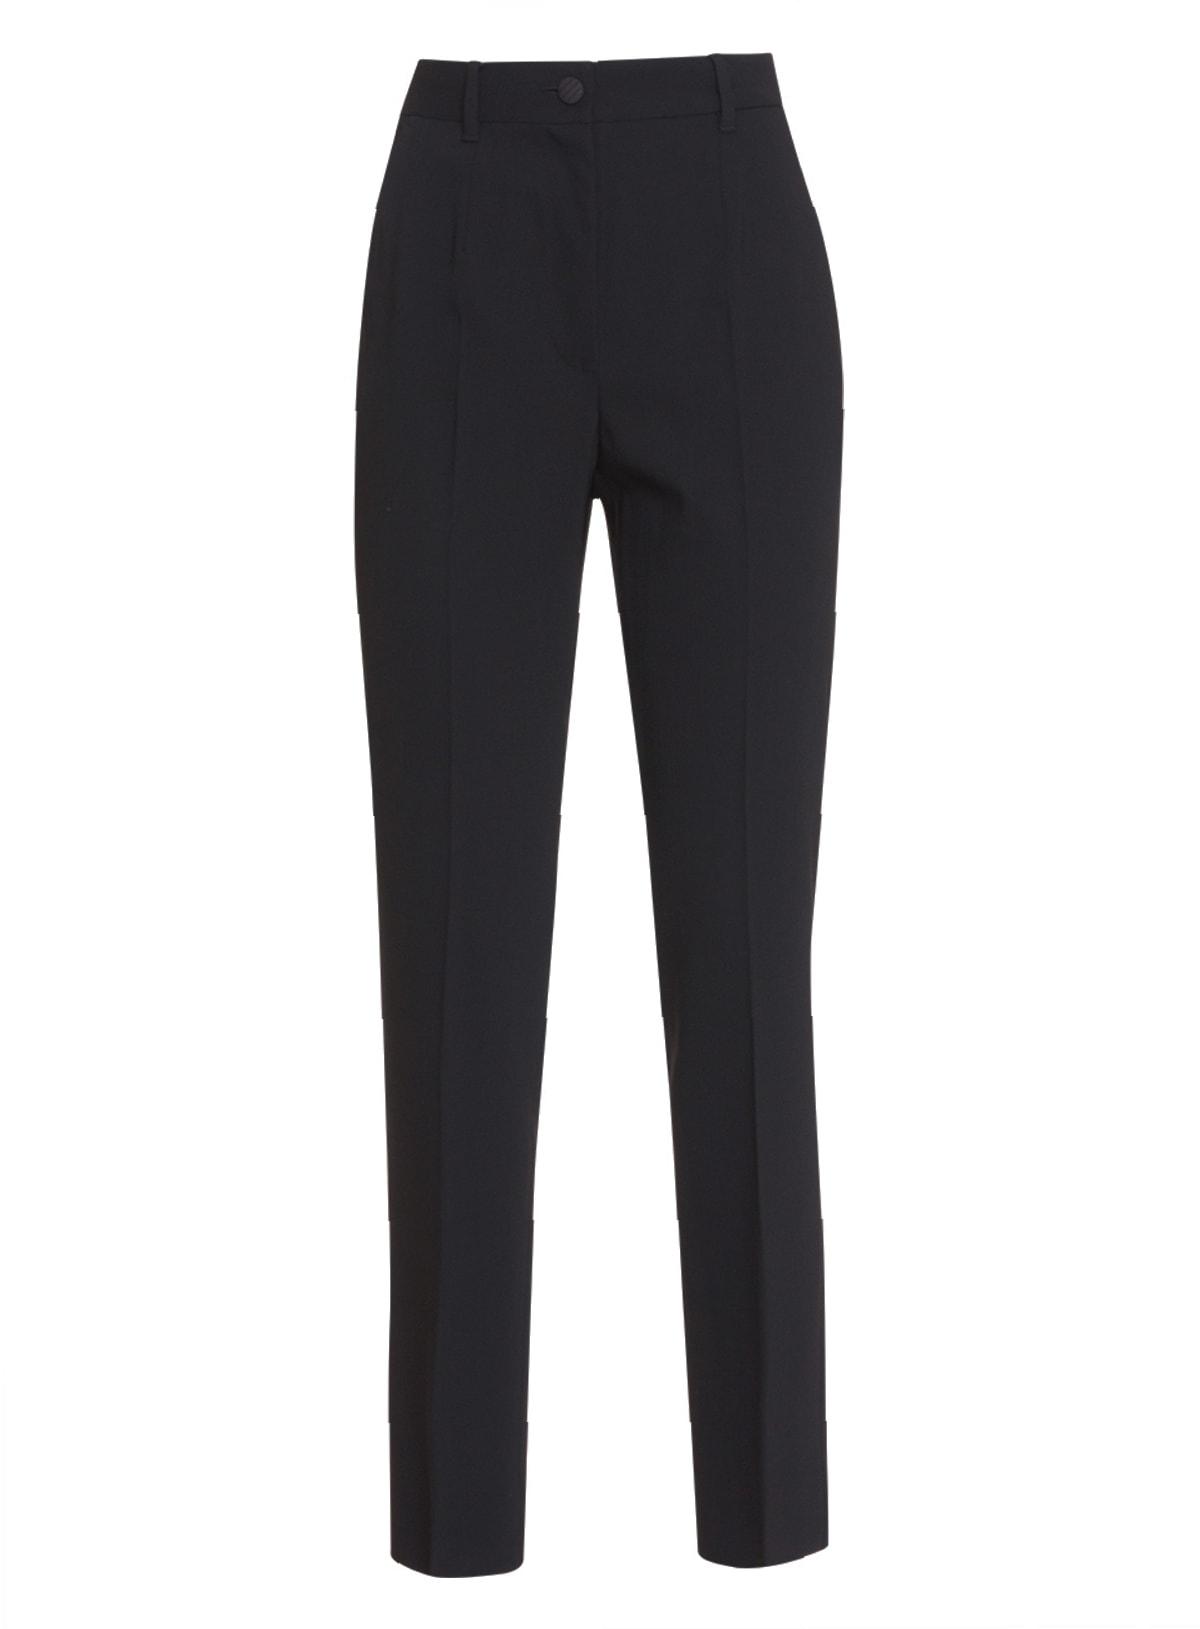 Dolce & Gabbana Classic Pants